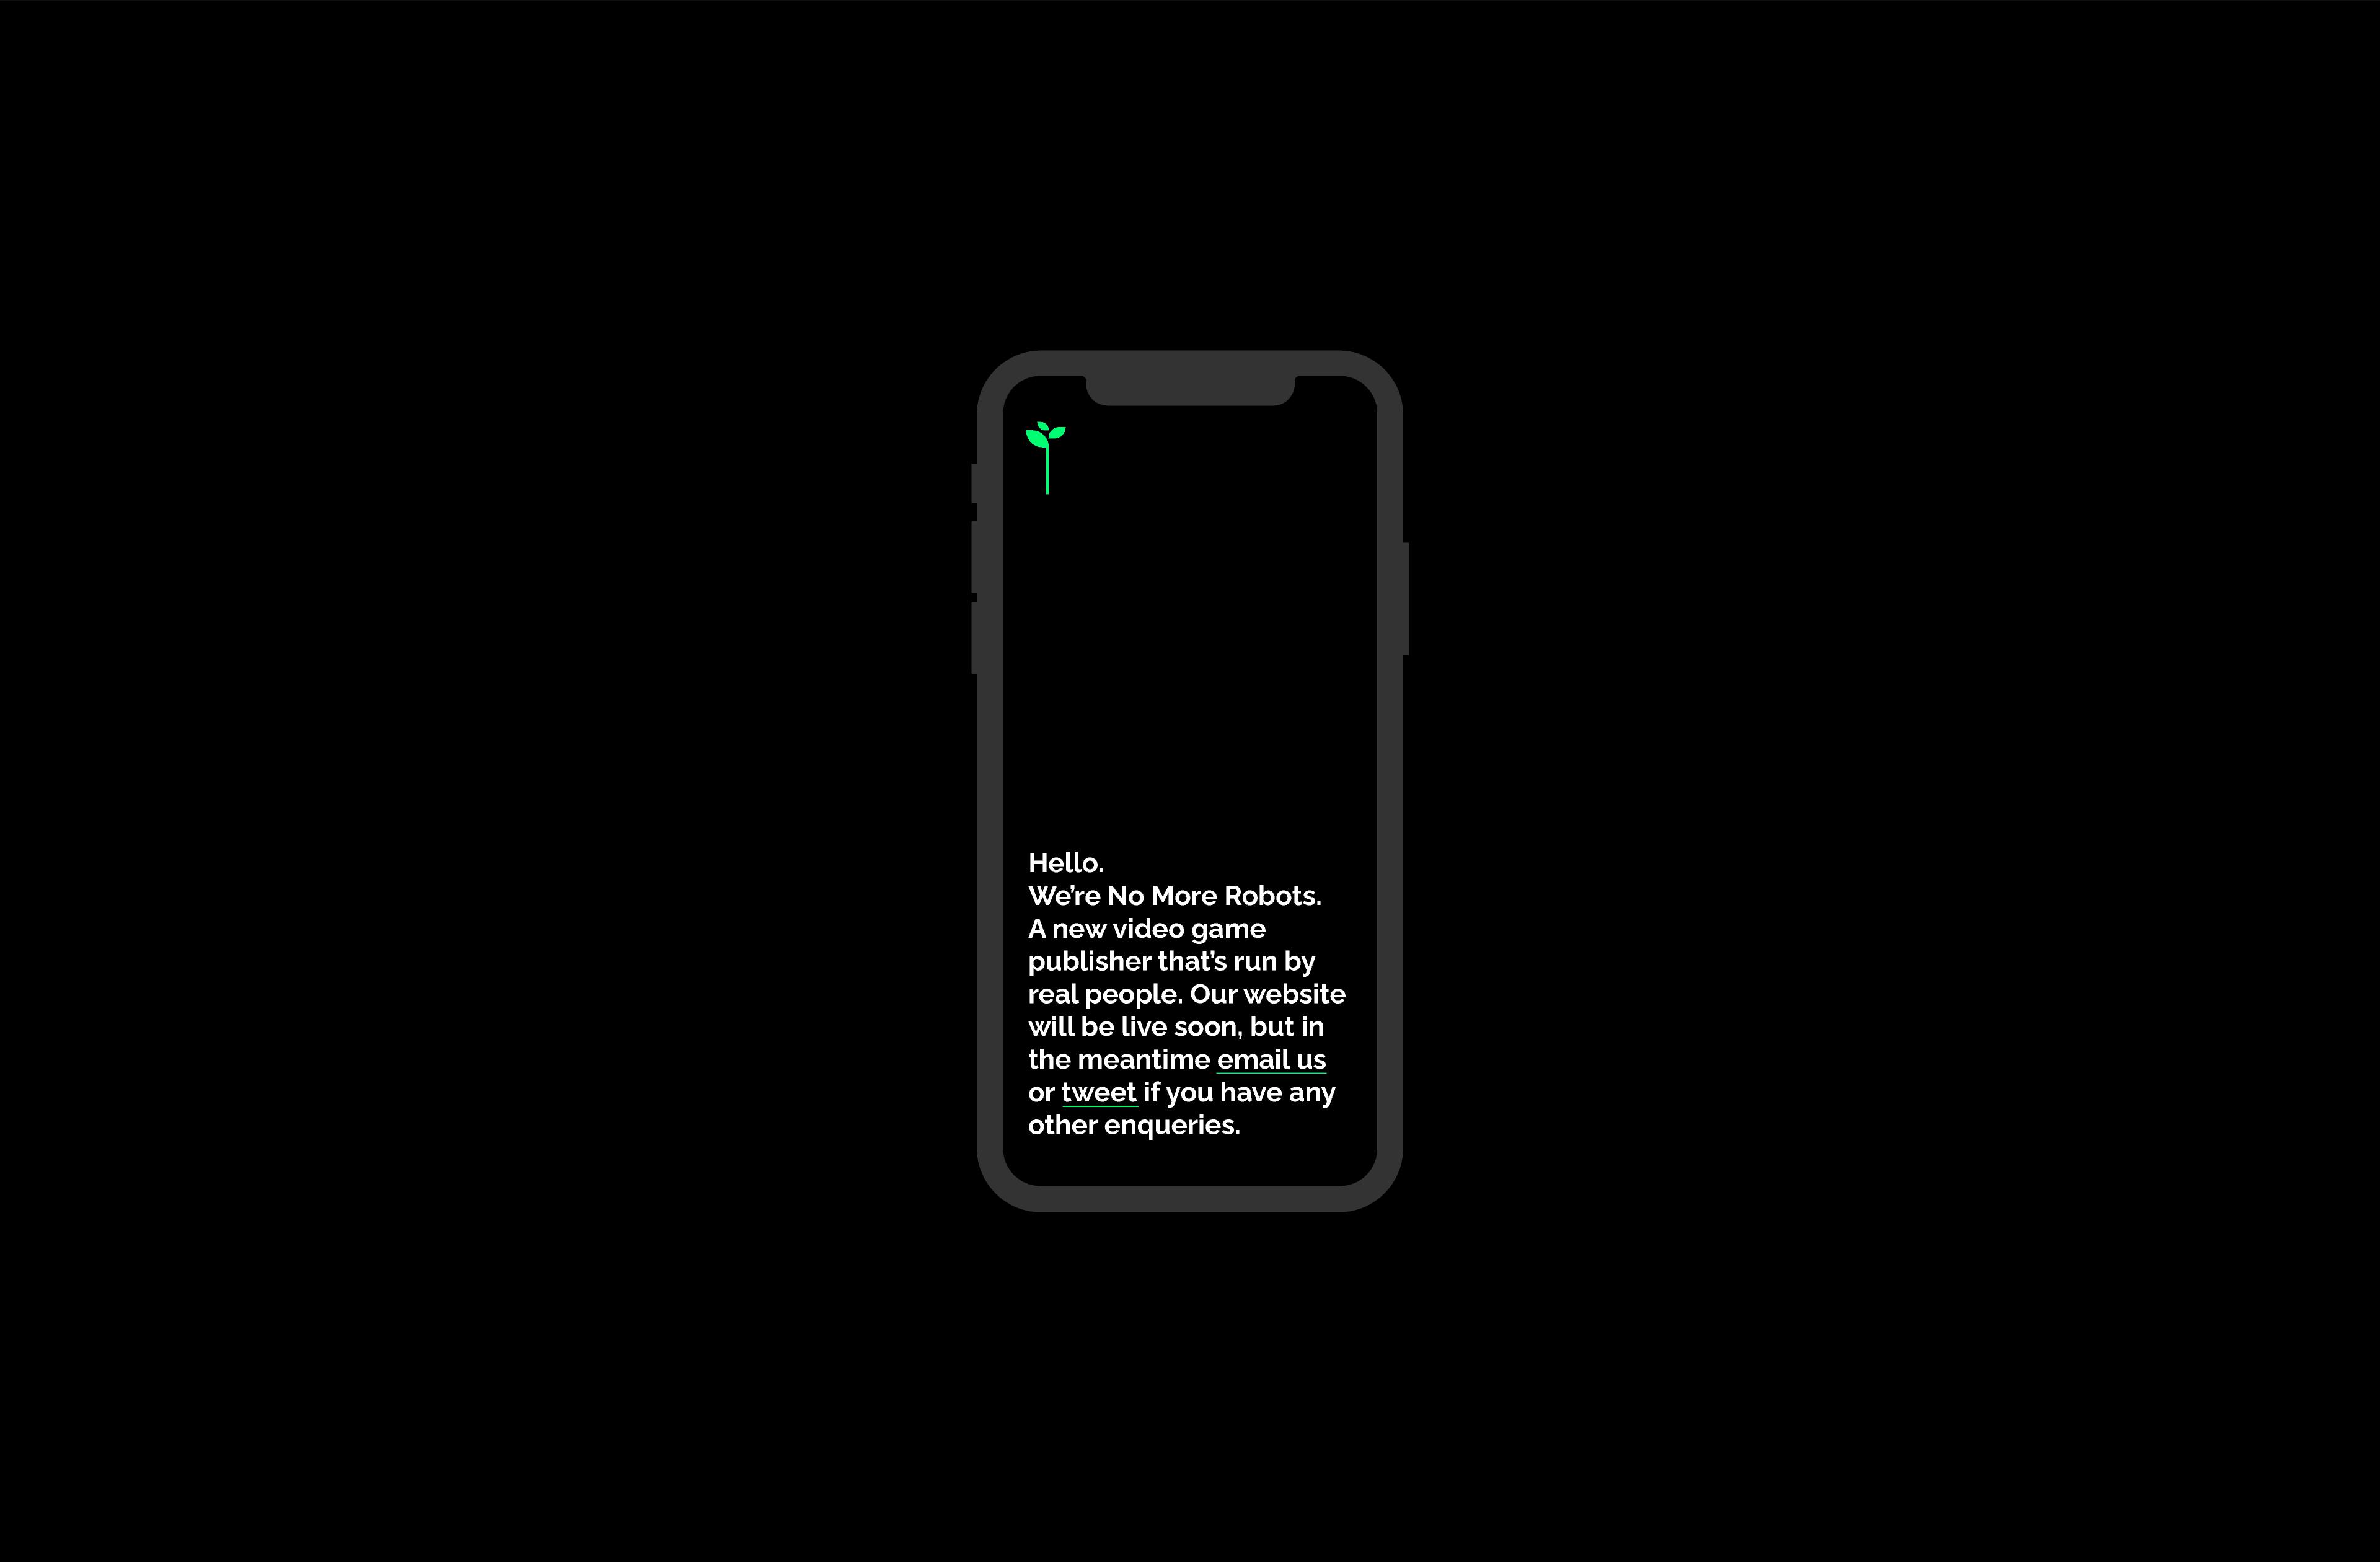 NMR-phone-2x